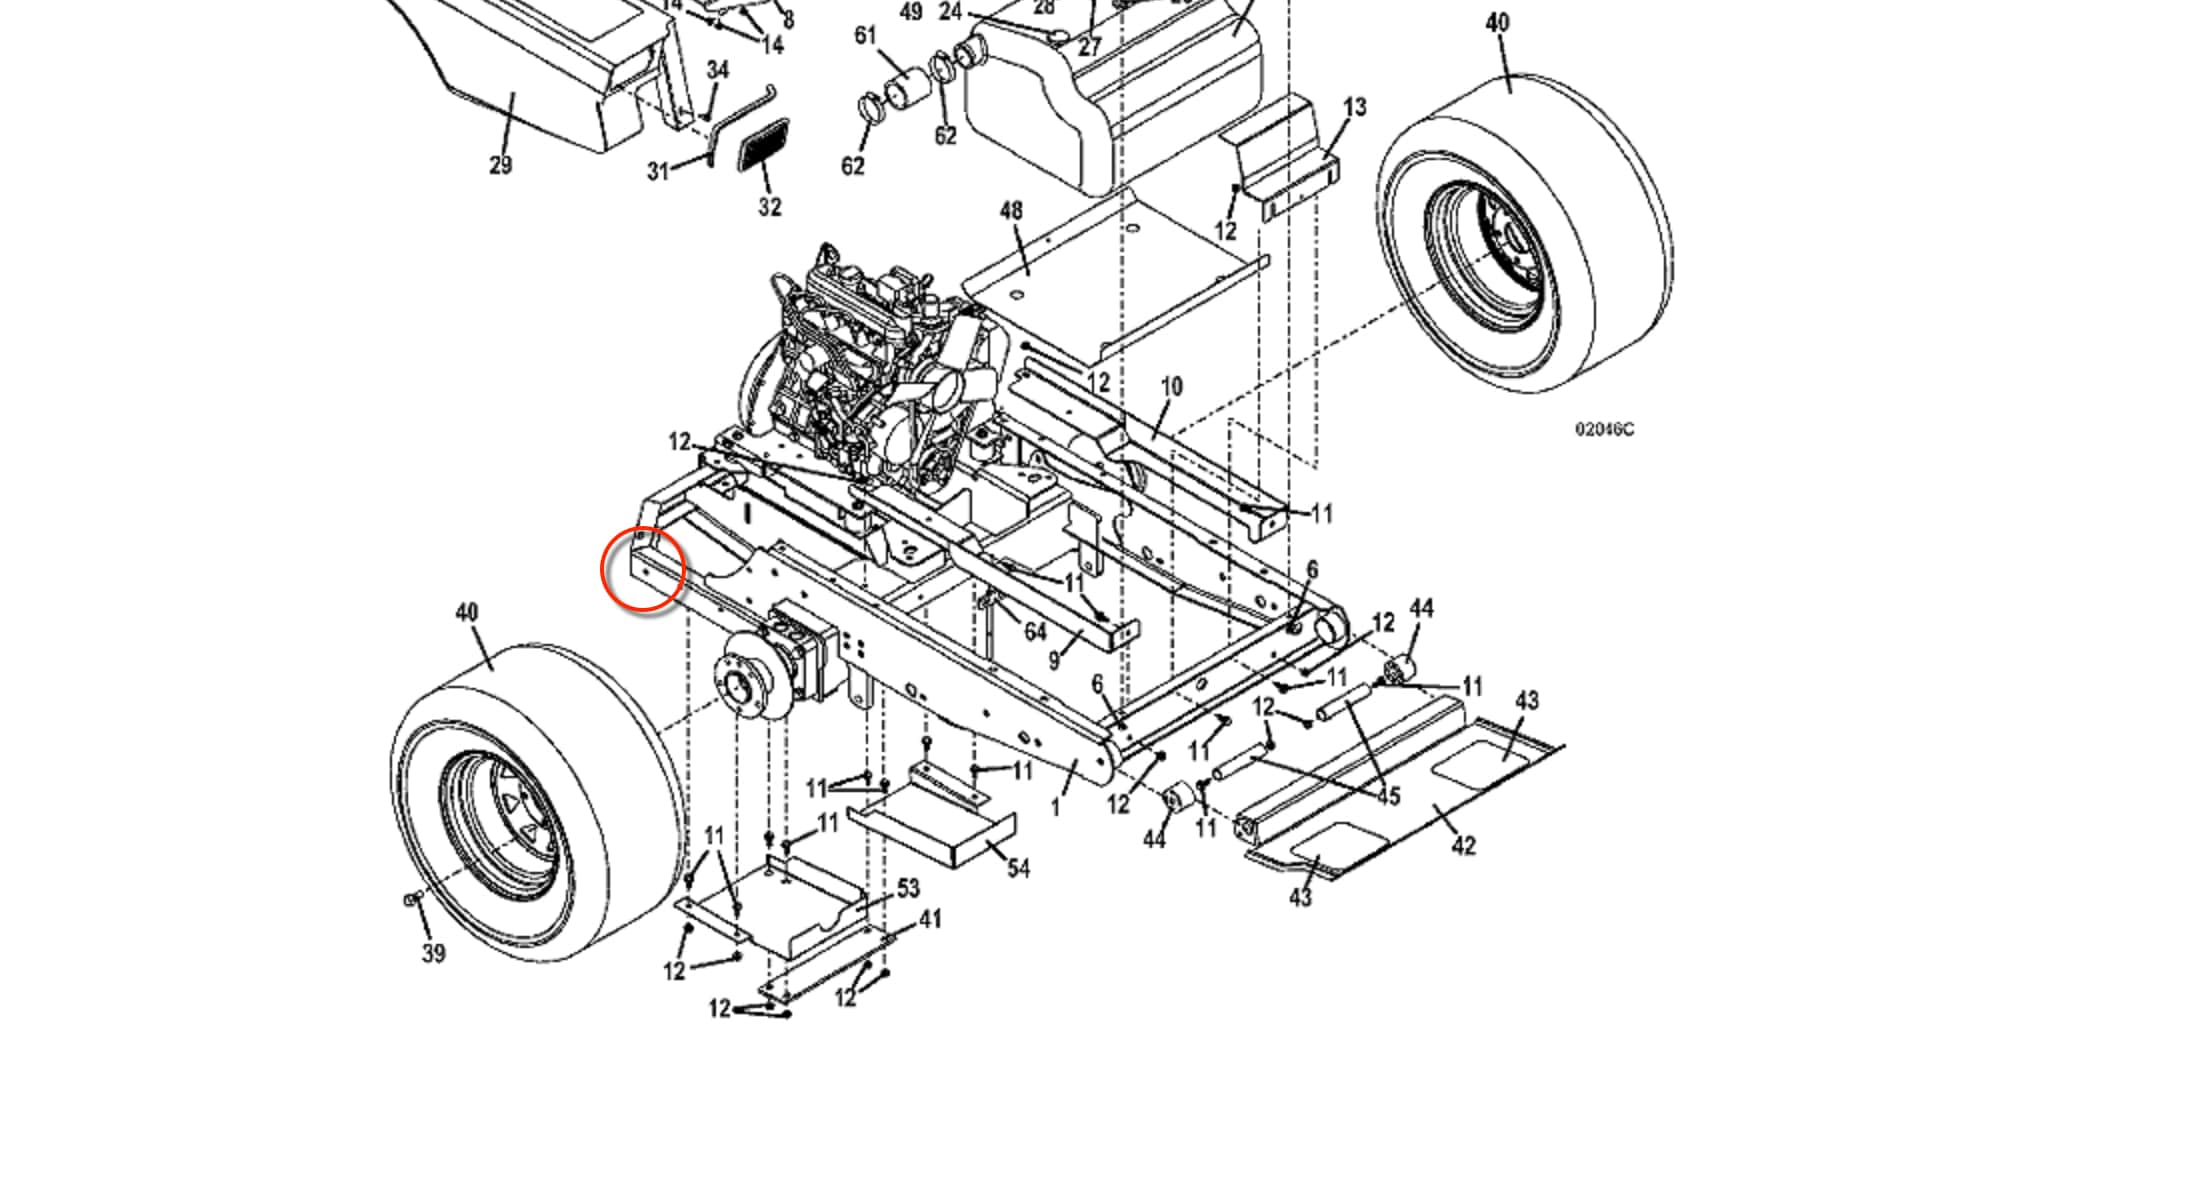 CheckMate™ for Grasshopper® 400 Diesel Series